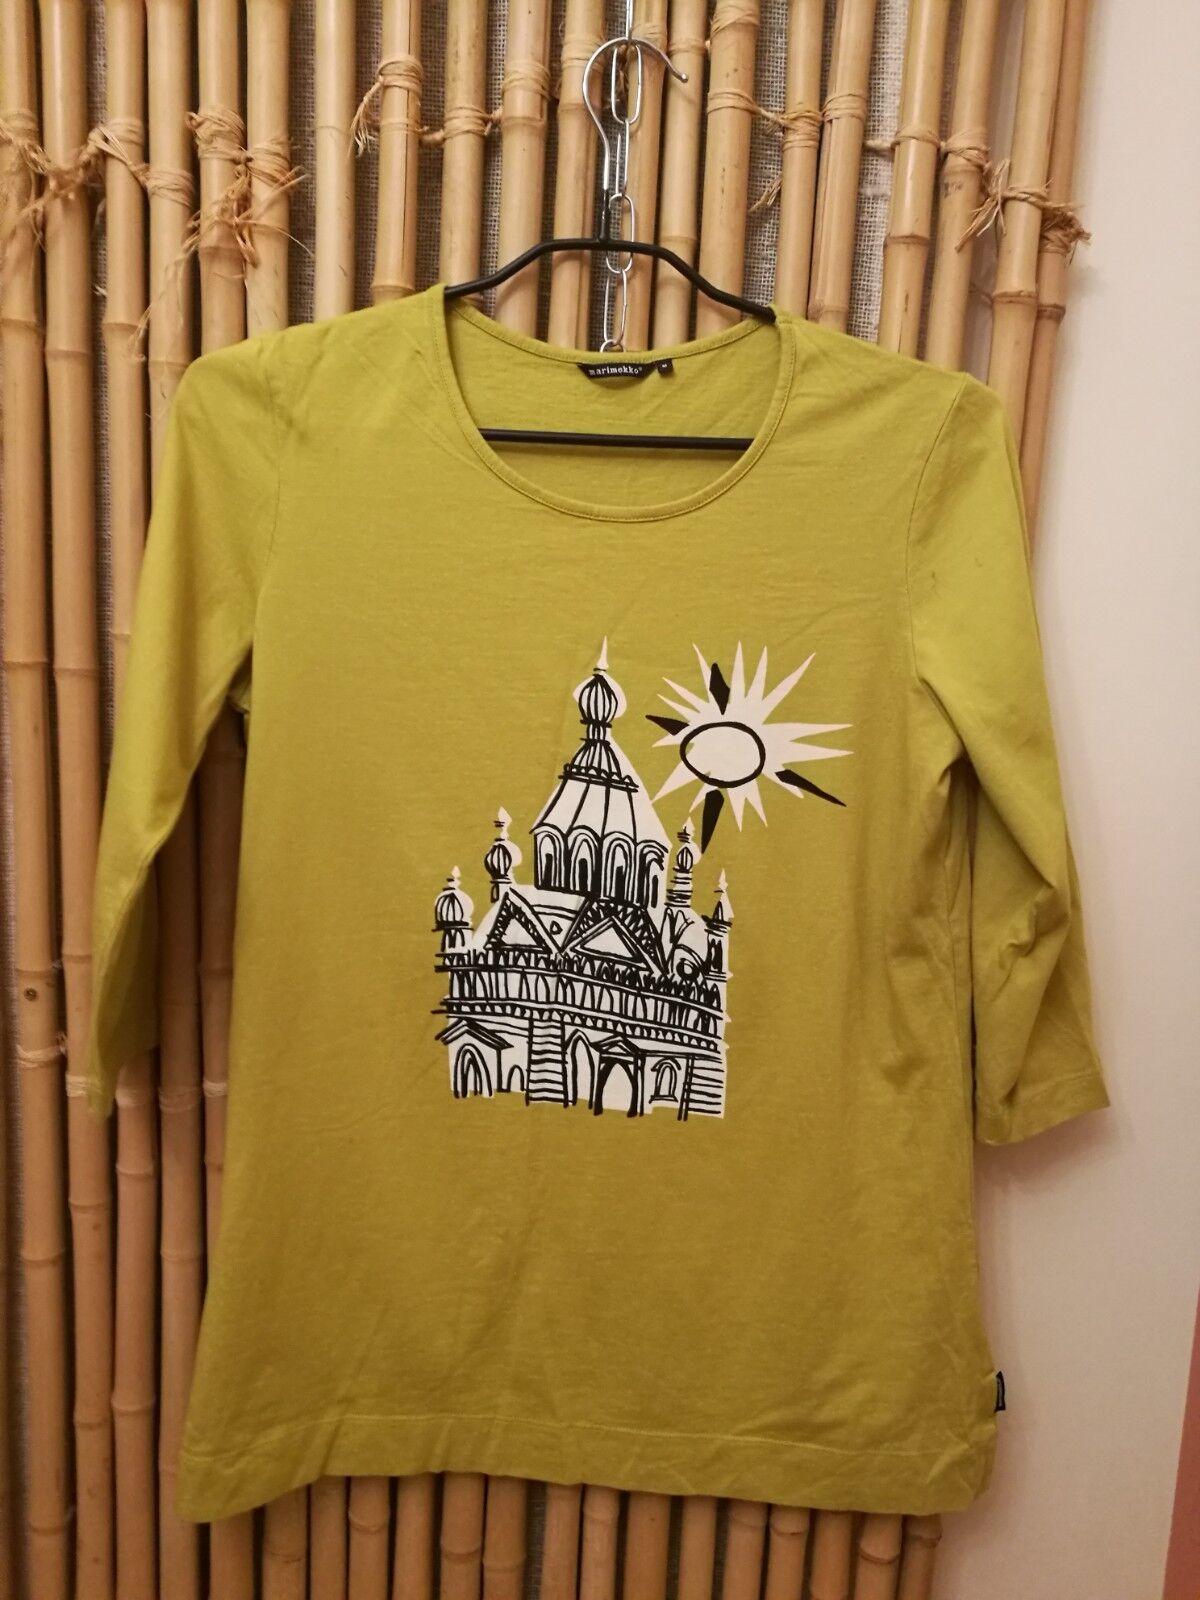 Women t-shirt Marimekko size M 100% cotton made in Portugal